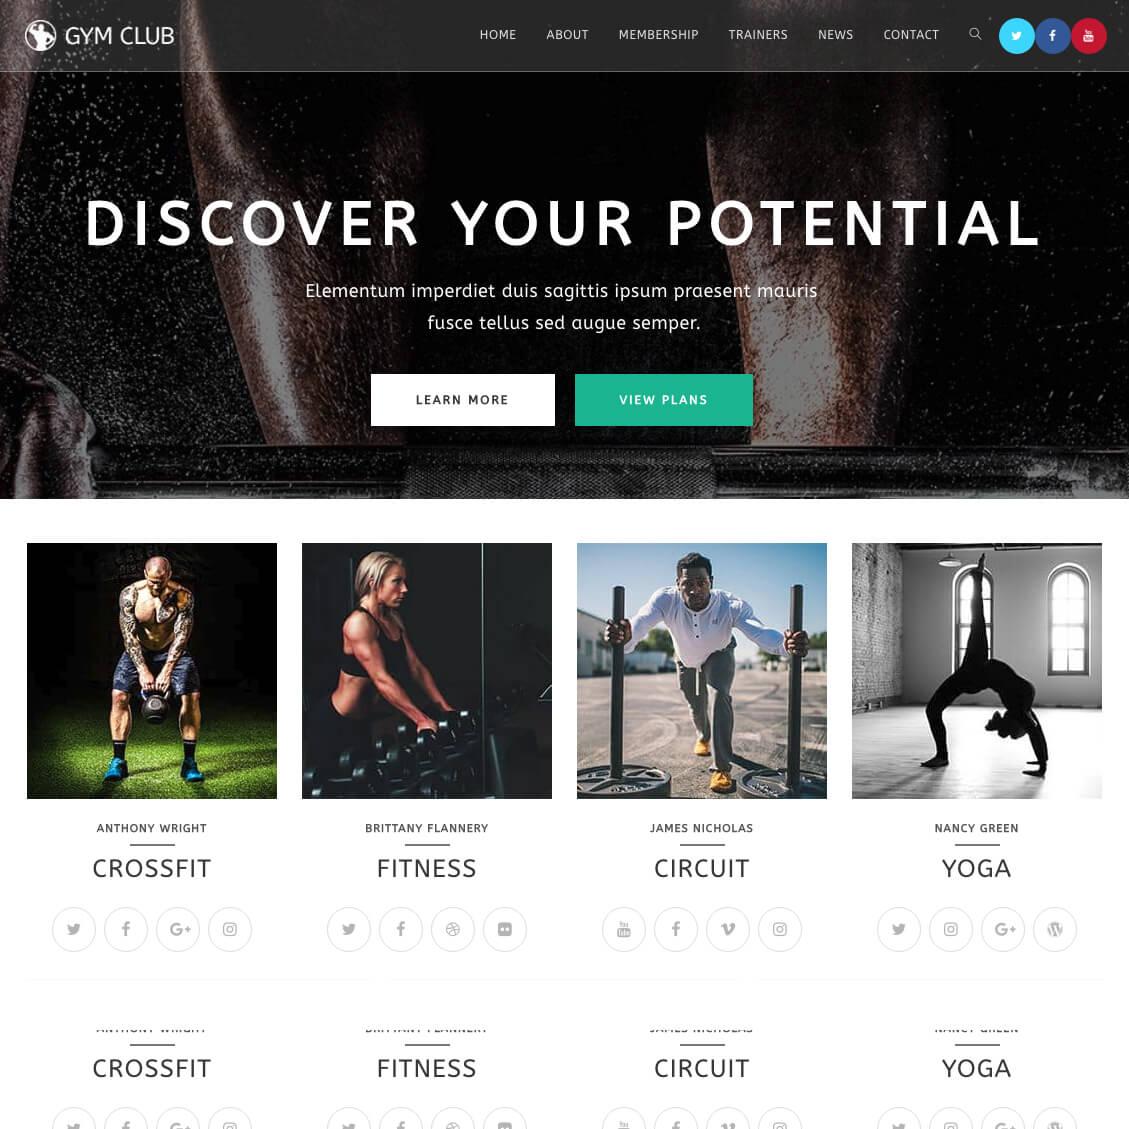 I will create a SEO friendly WordPress website